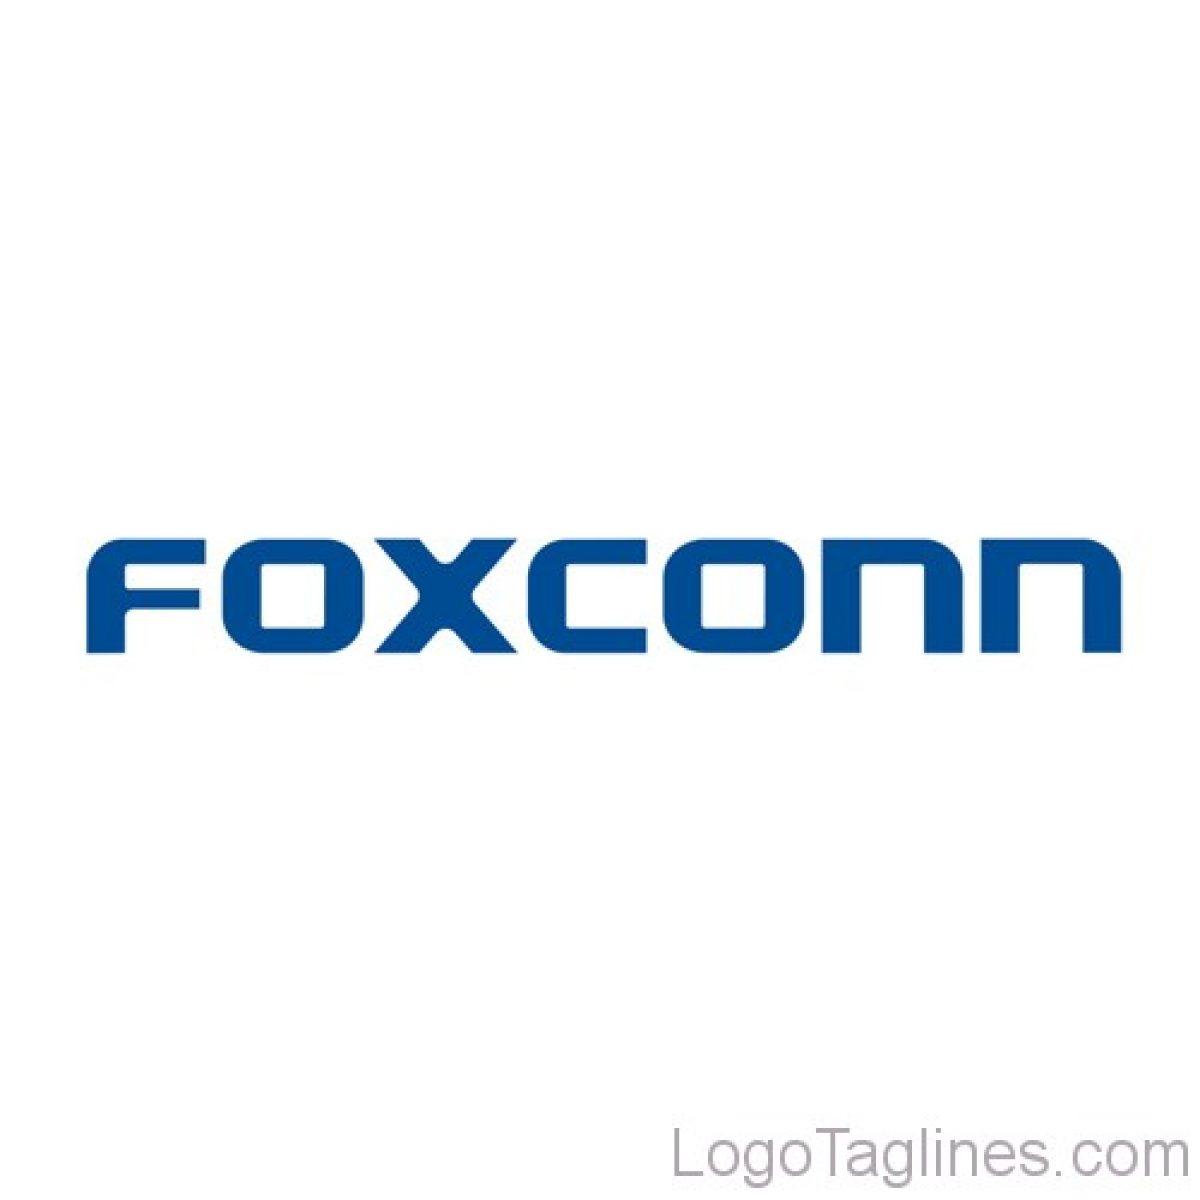 Foxconn-Logo-Tagline-slogan-motto-1200x1200